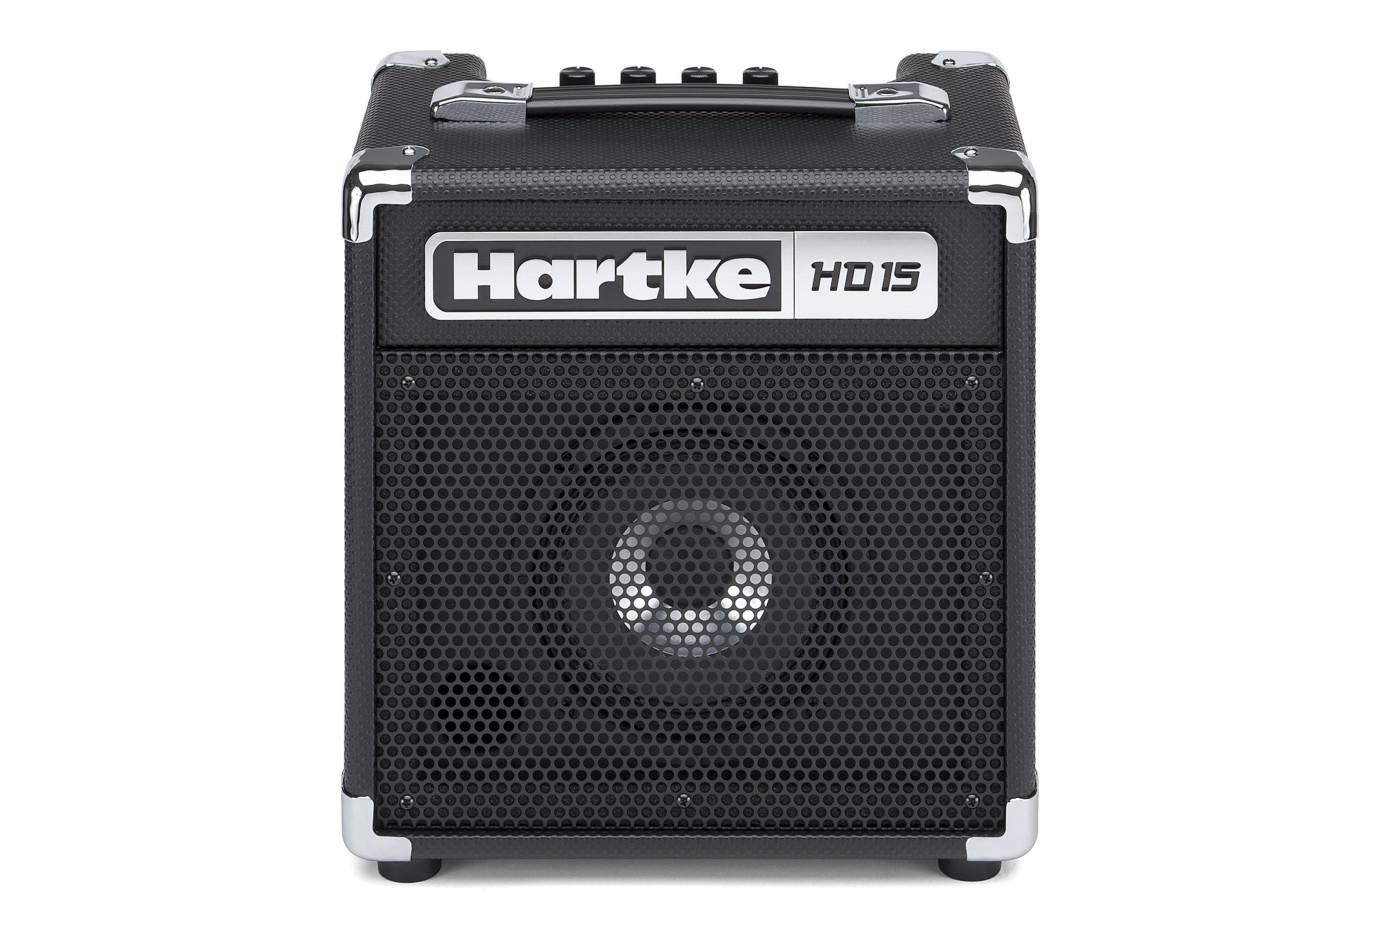 hartke hd15 15w bass combo amp. Black Bedroom Furniture Sets. Home Design Ideas